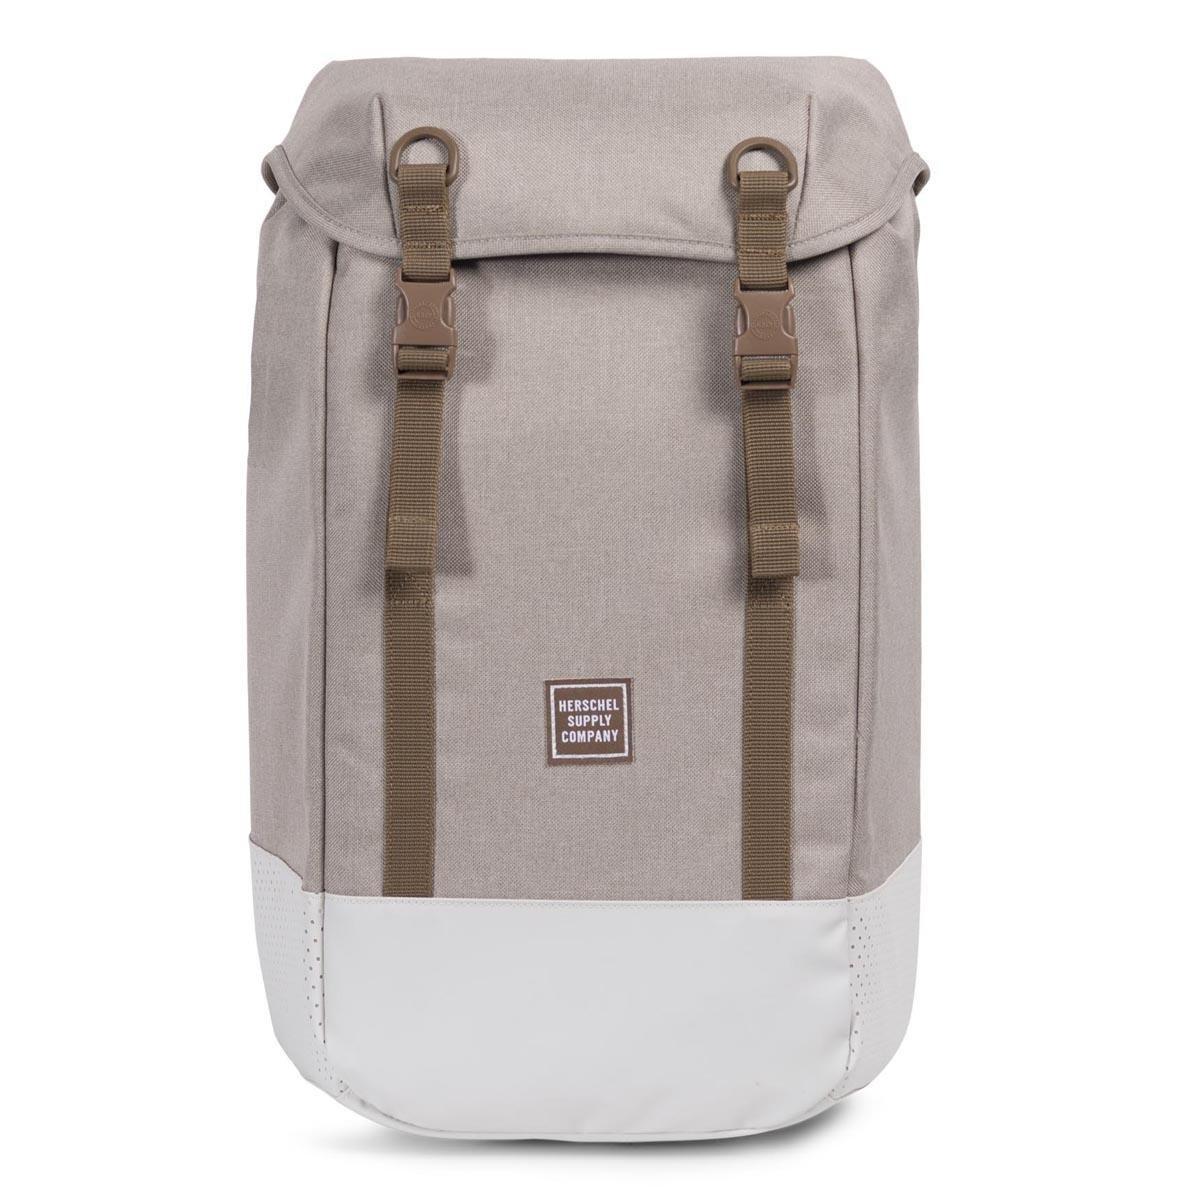 d1673683f3 Herschel Supply Co. Women s Natural Light Khaki Crosshatch Iona Backpack